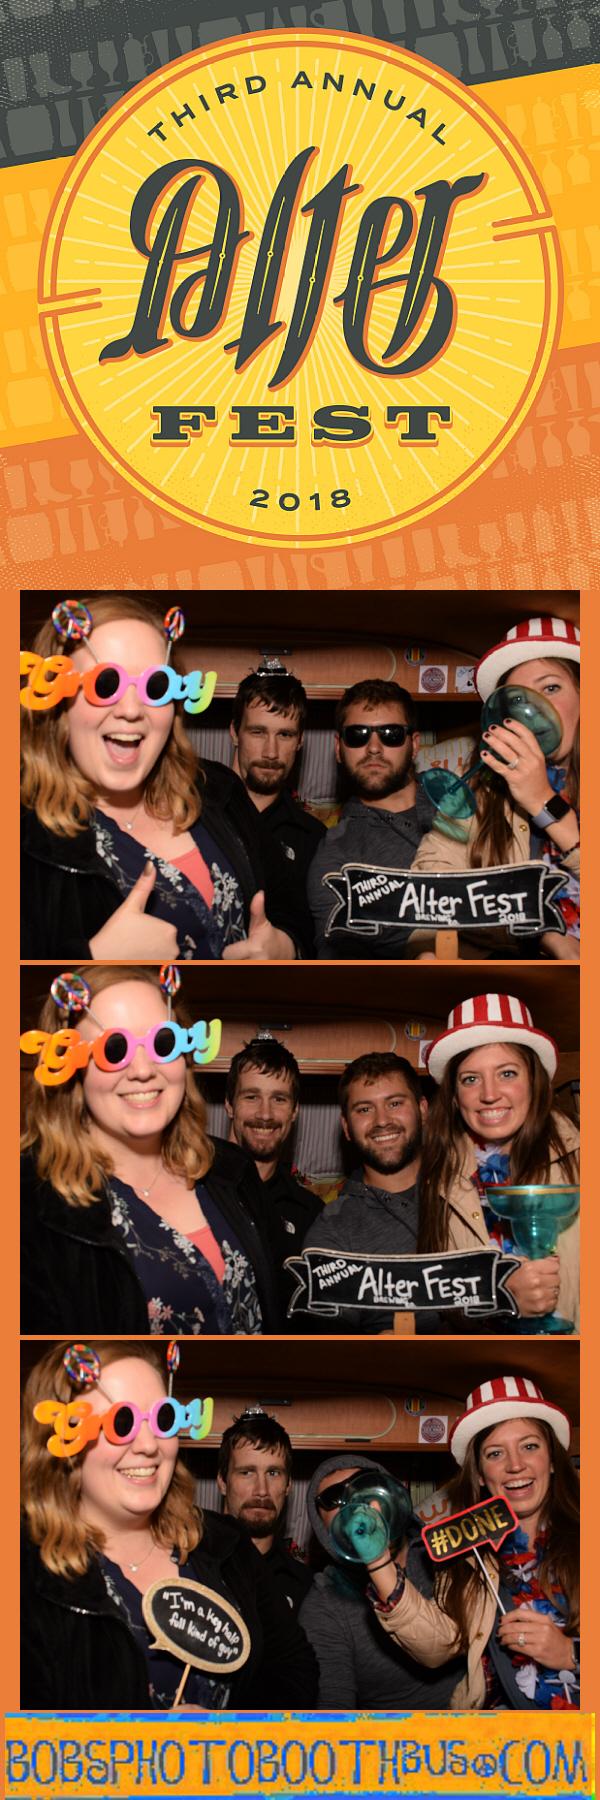 AlterFest2018bobsphotoboothbusrobertkinsloe_19.jpg